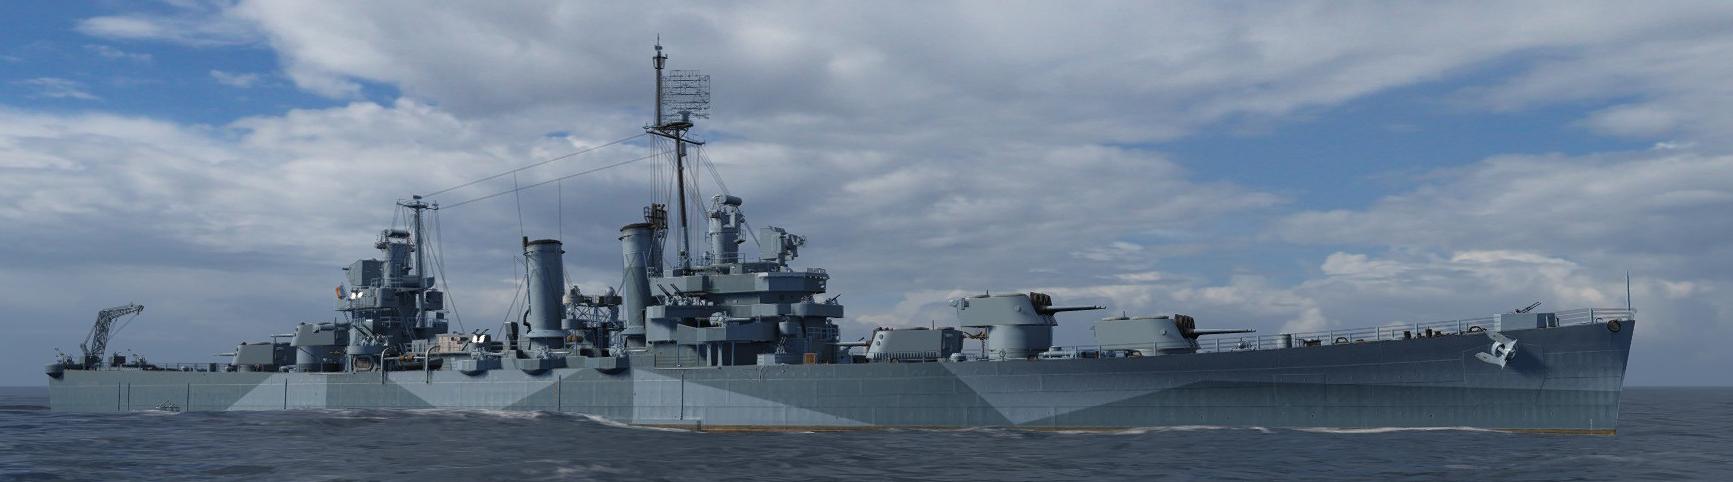 The cruiser ARA Nine de julio